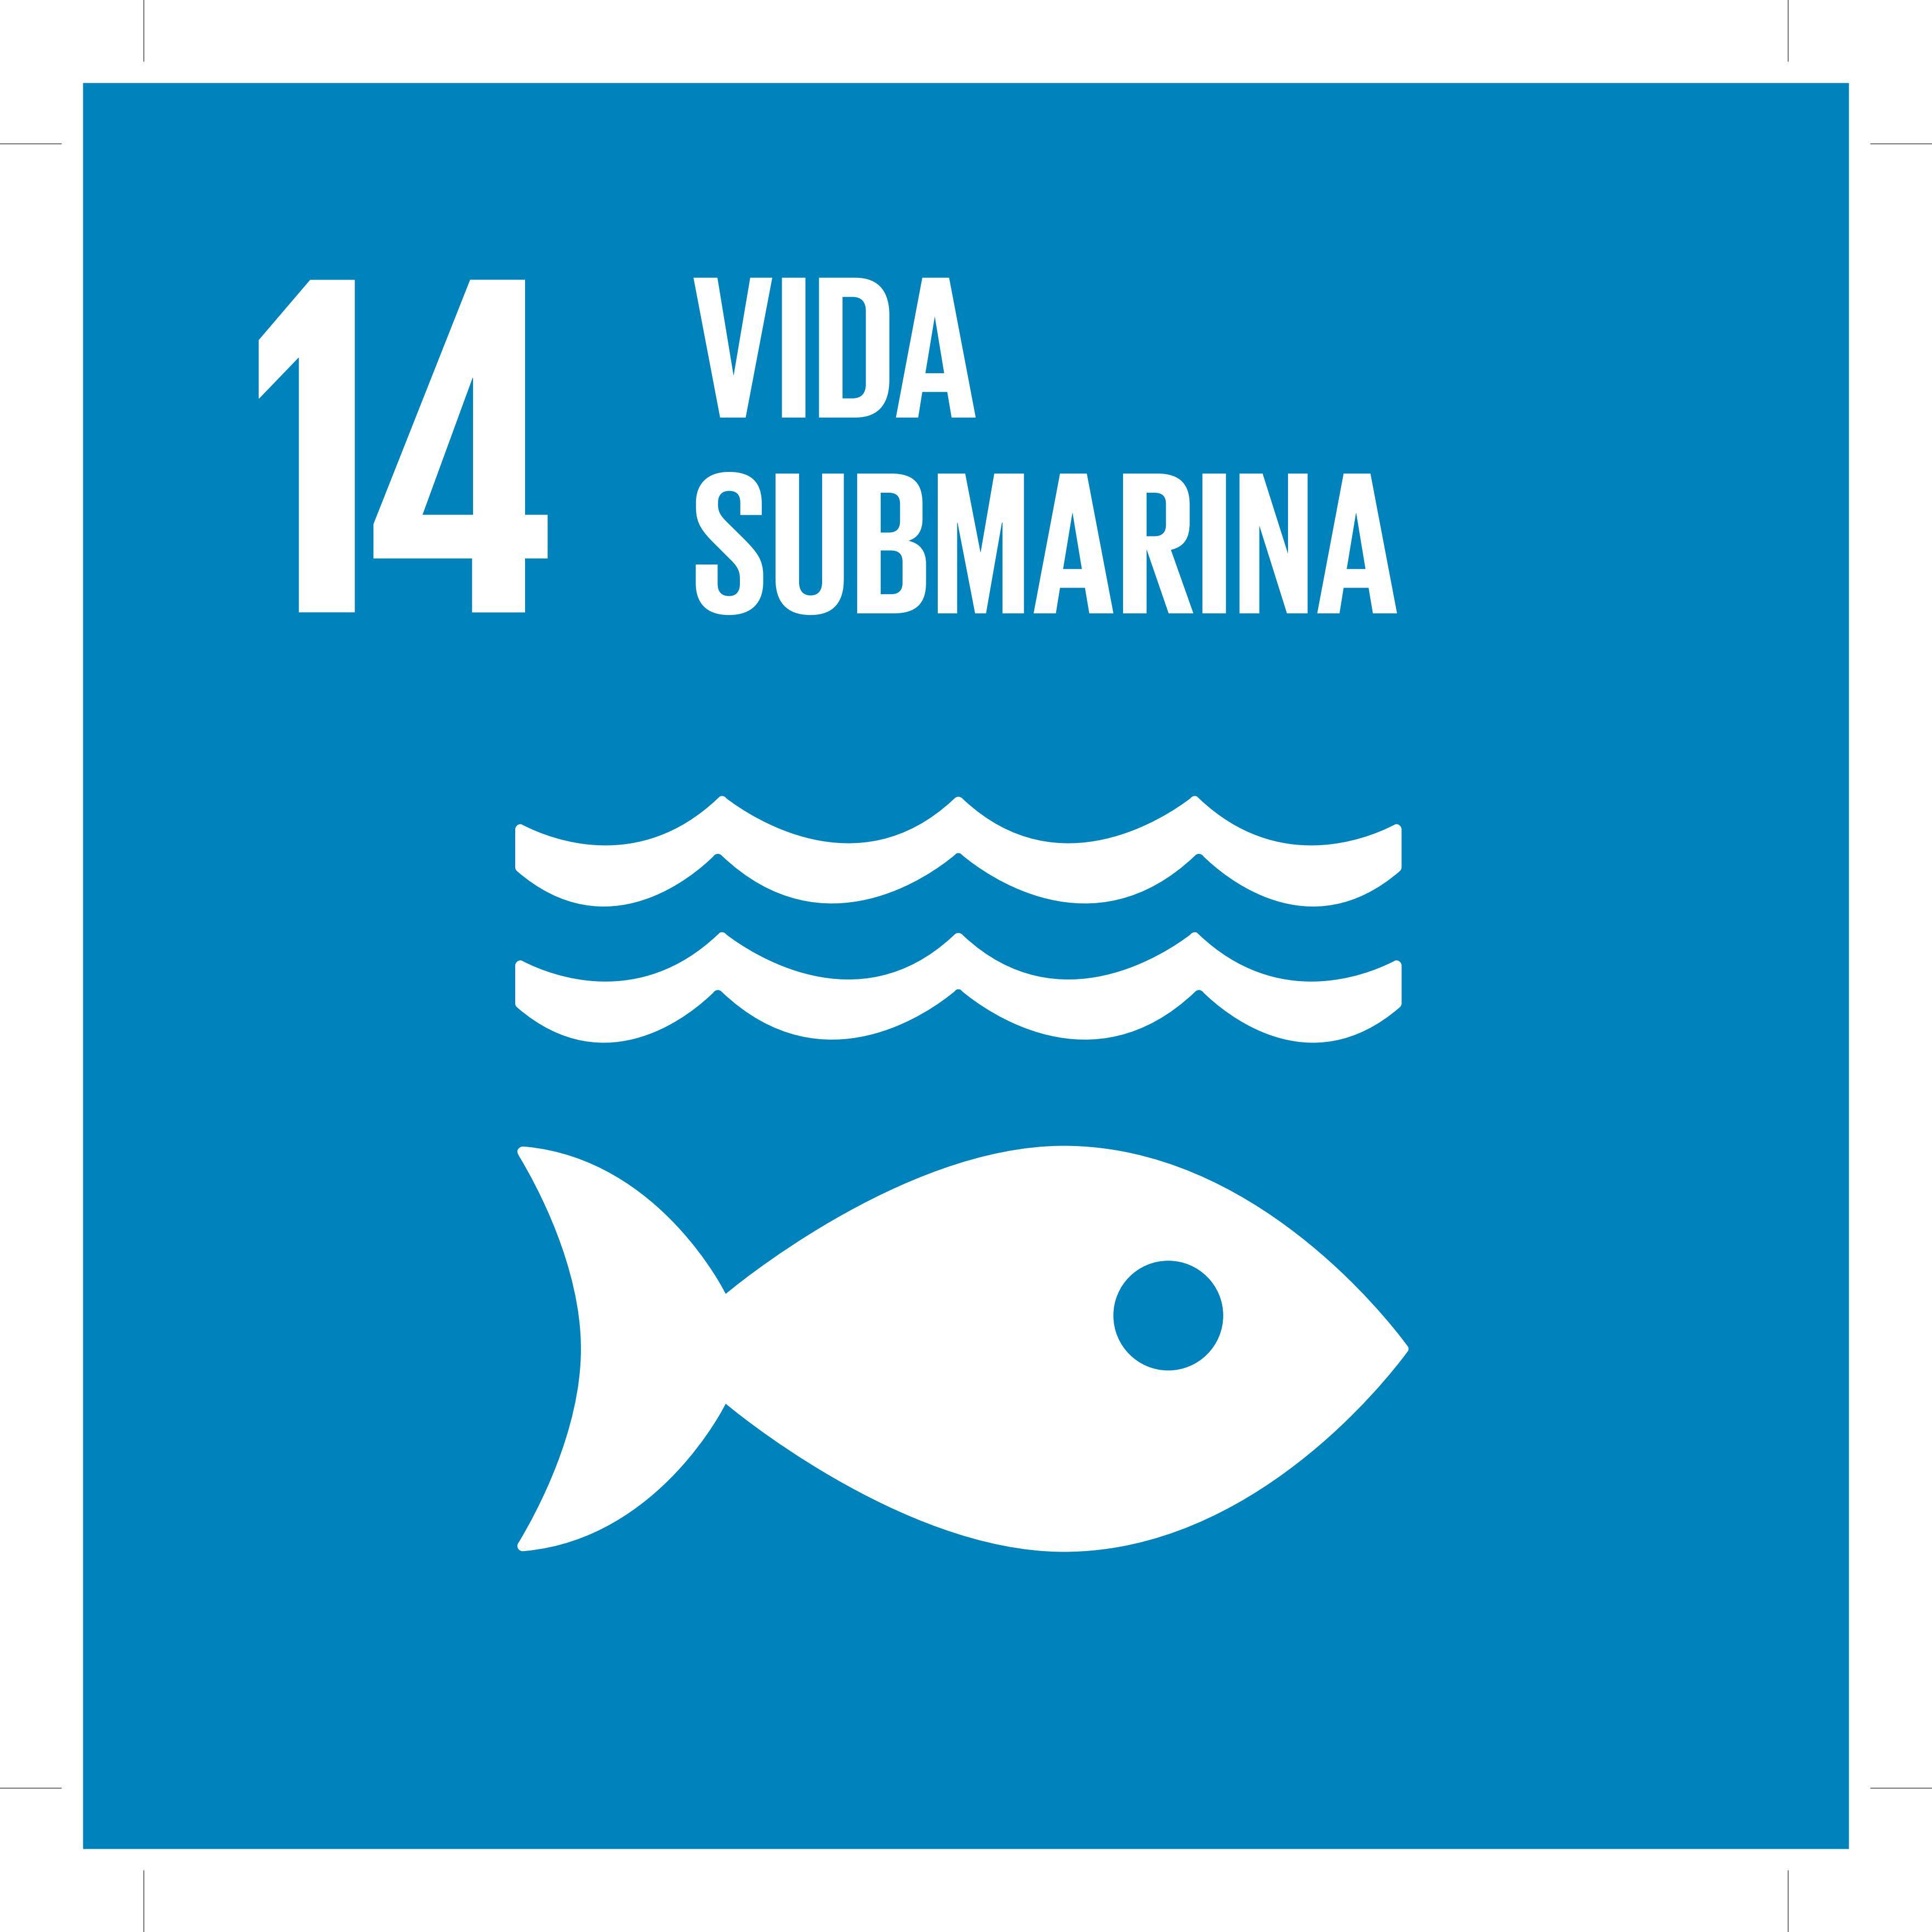 ODS14 - Vida Submarina